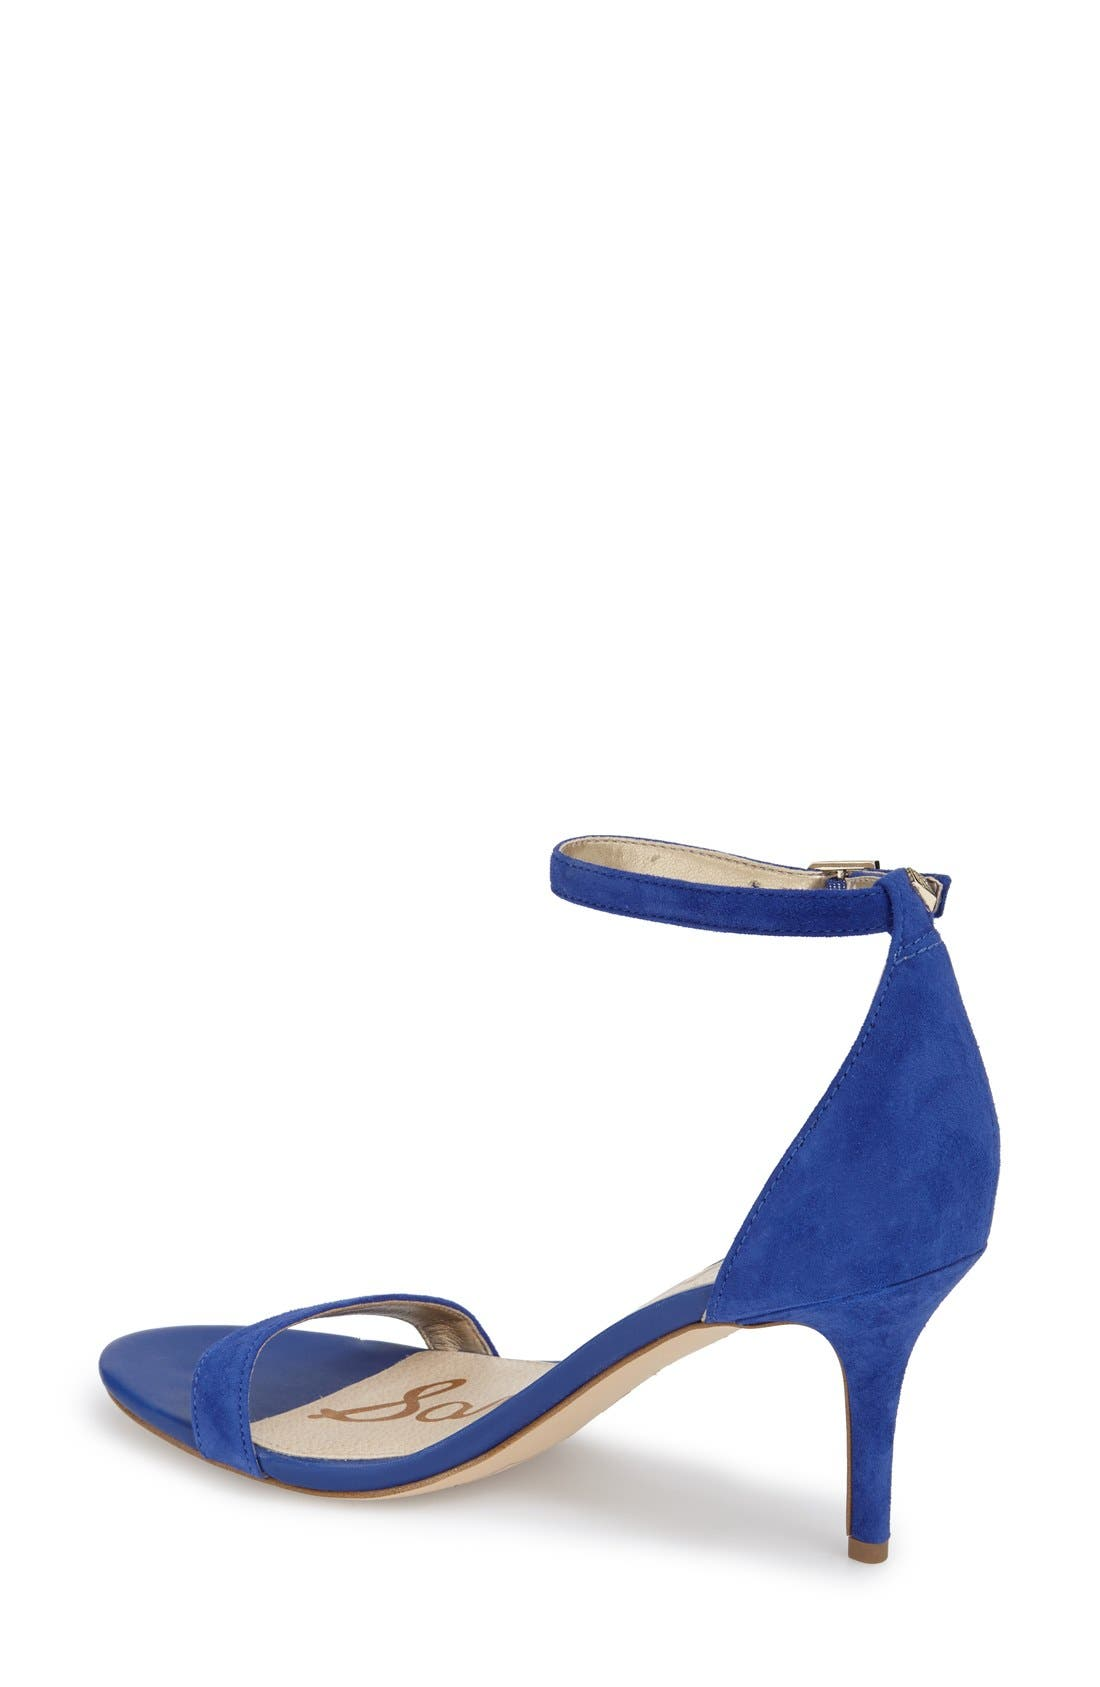 ,                             'Patti' Ankle Strap Sandal,                             Alternate thumbnail 195, color,                             402